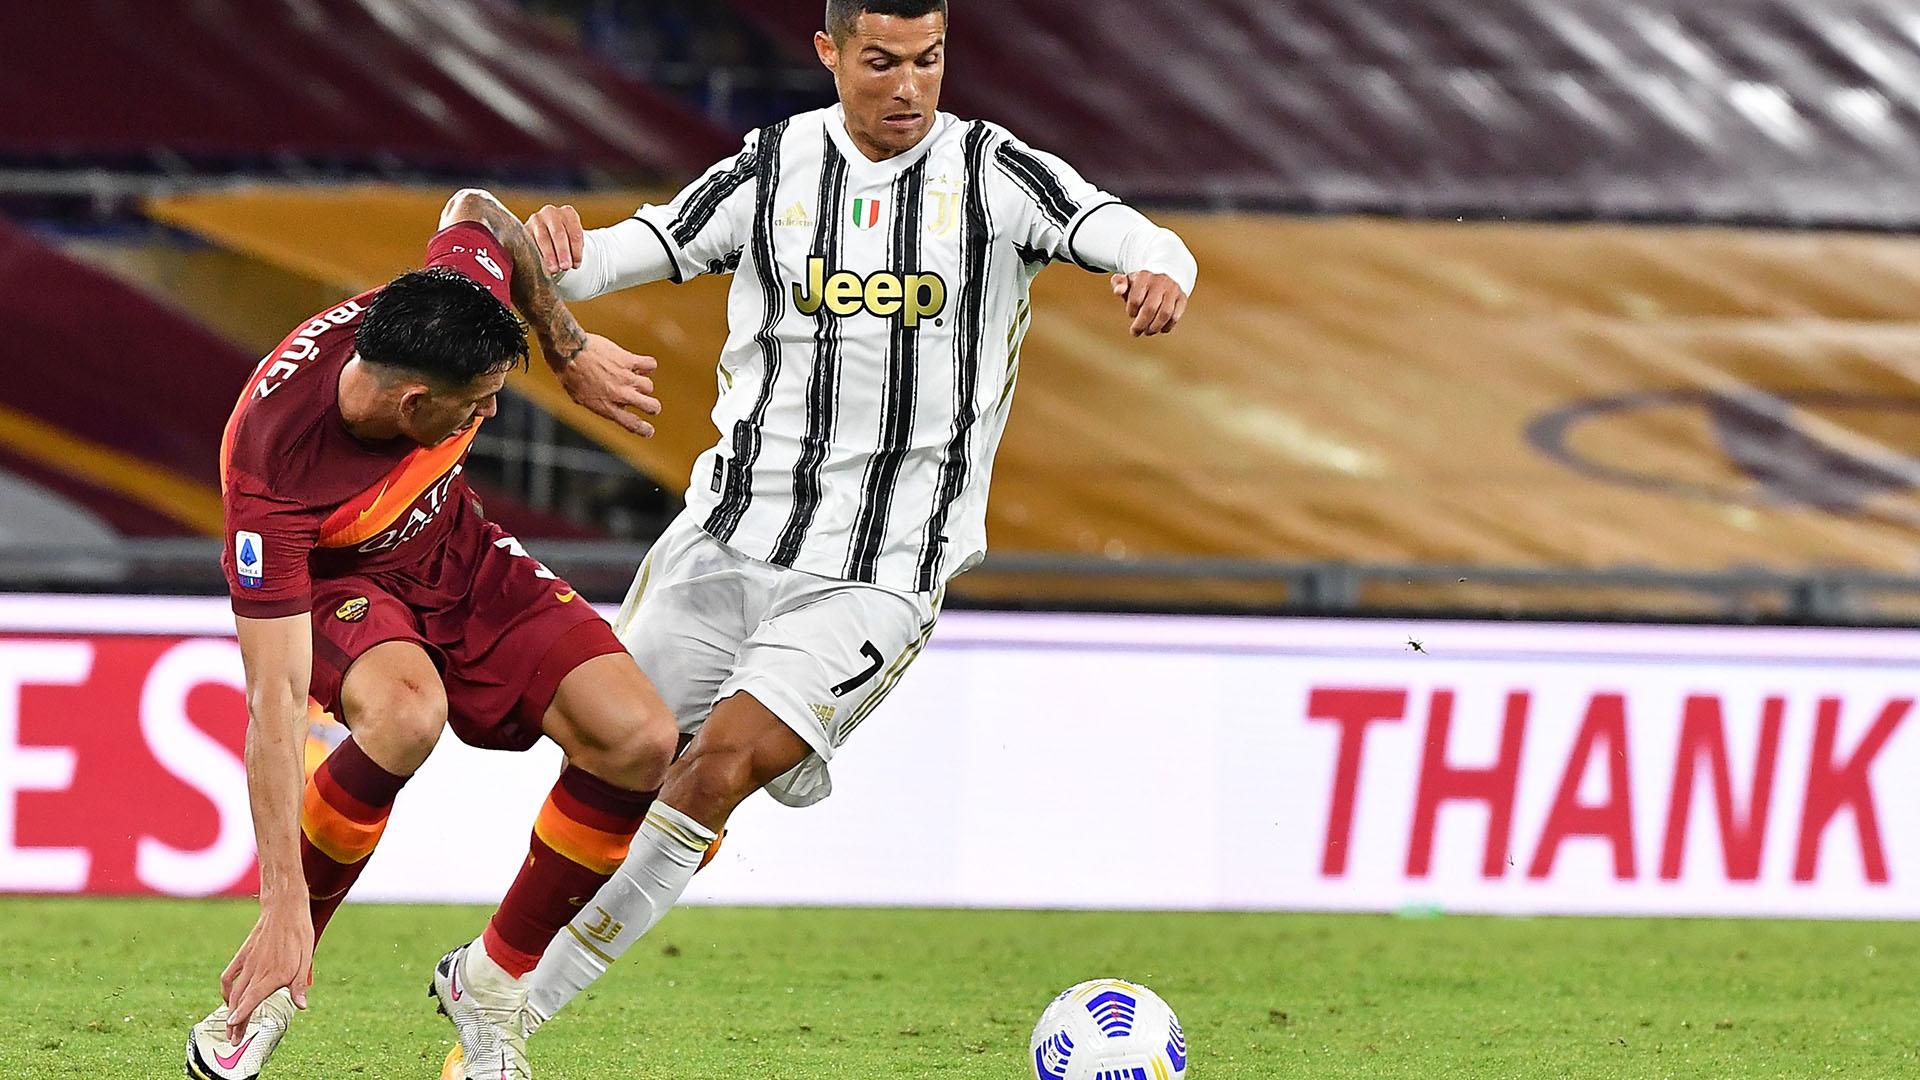 Le foto di Roma-Juventus 2-2 - Le foto di Roma-Juventus 2-2 | Virgilio Sport